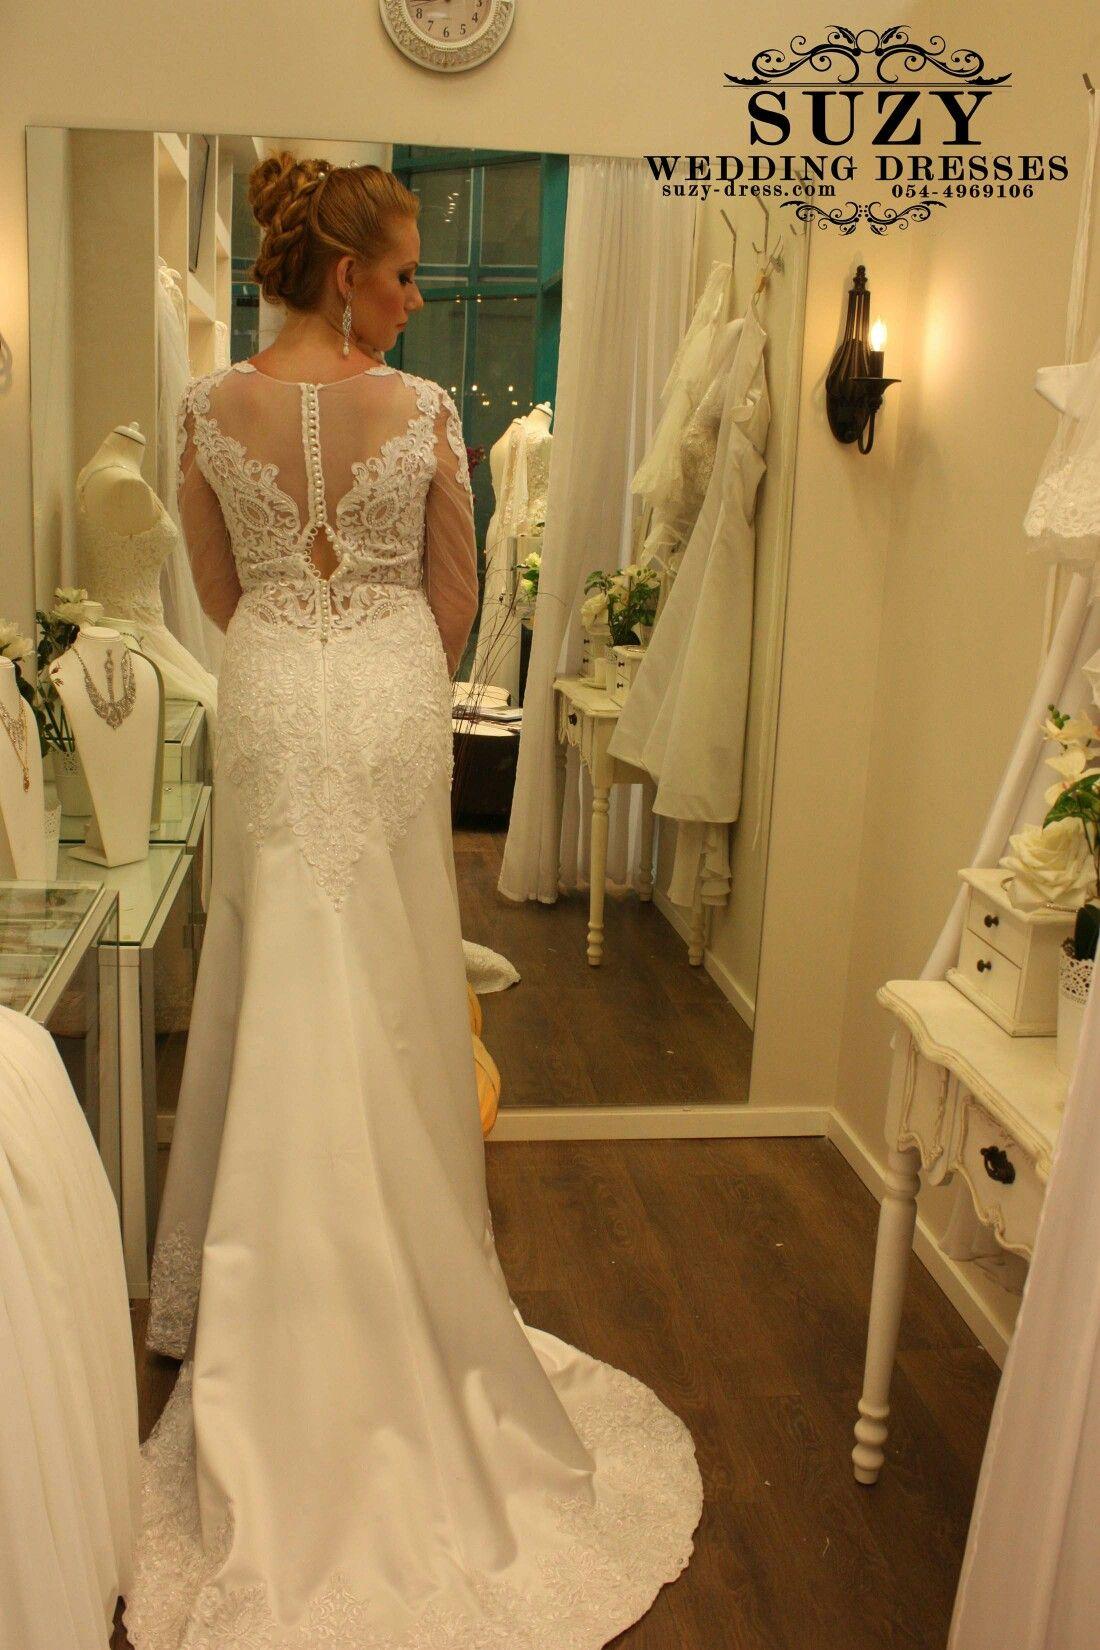 Pin by su na on wedding dresses by suzy nachman pinterest